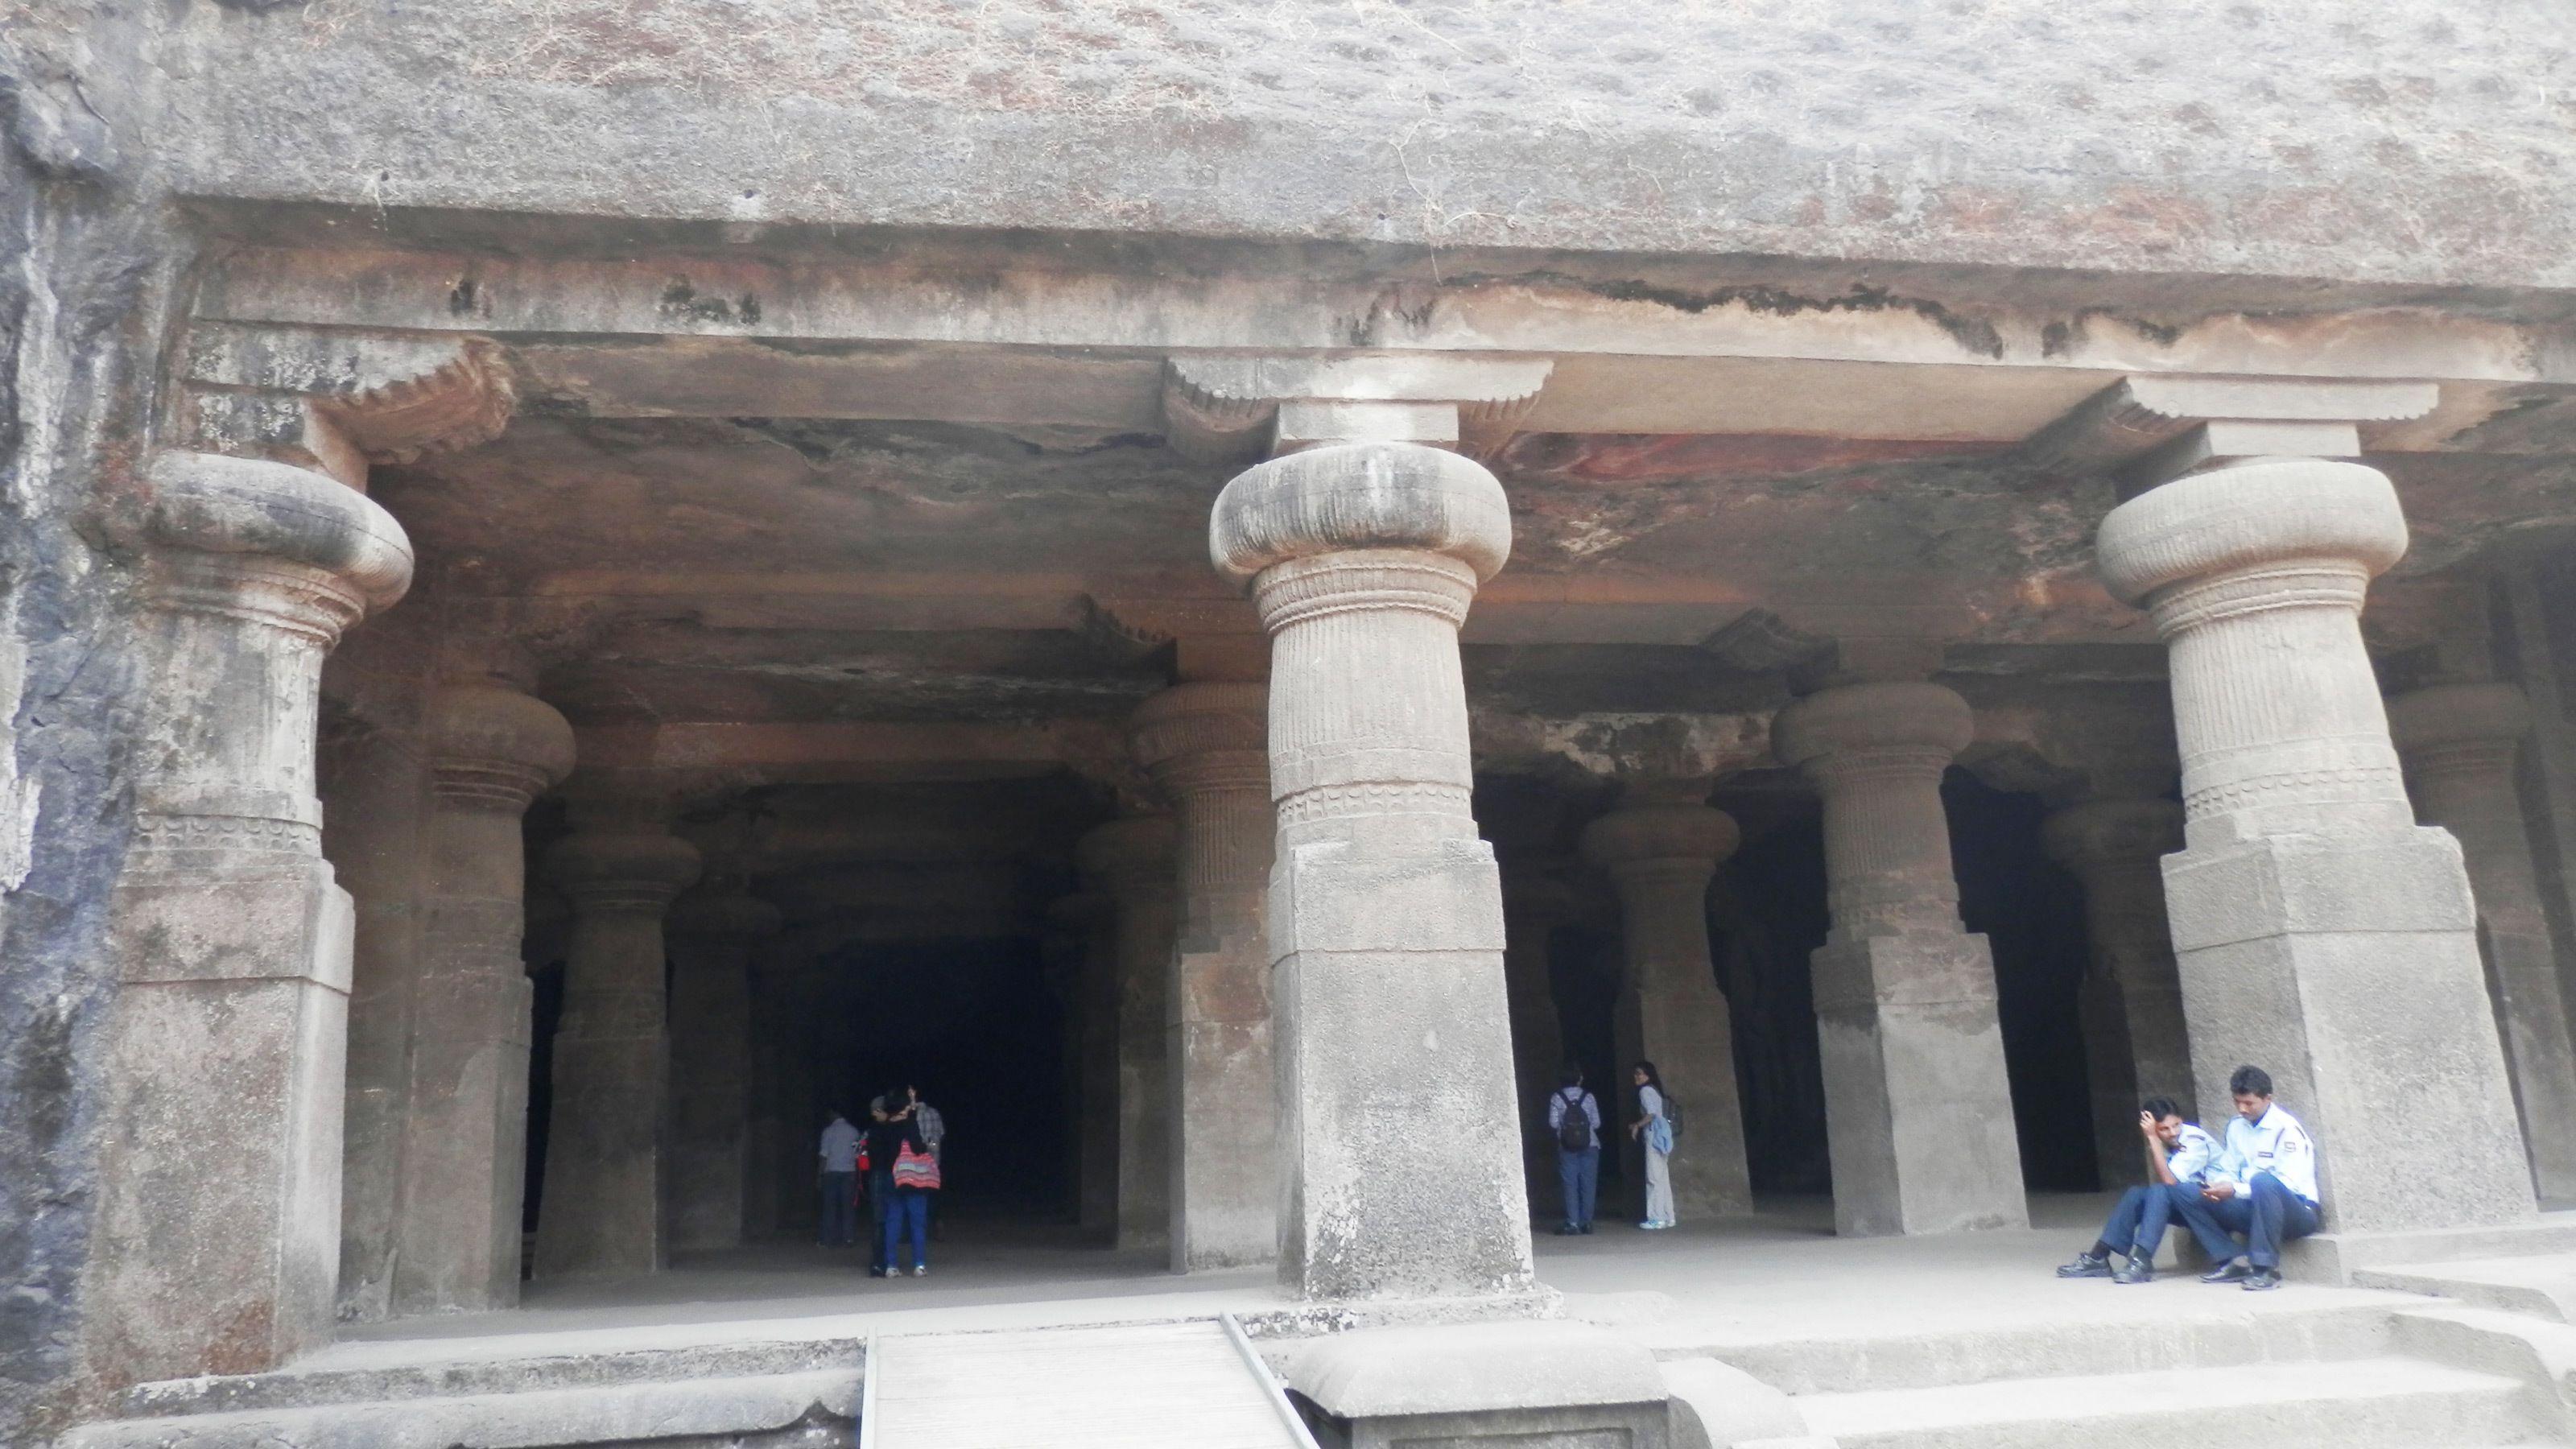 Columns at the Elephanta Caves near mumbai harbor